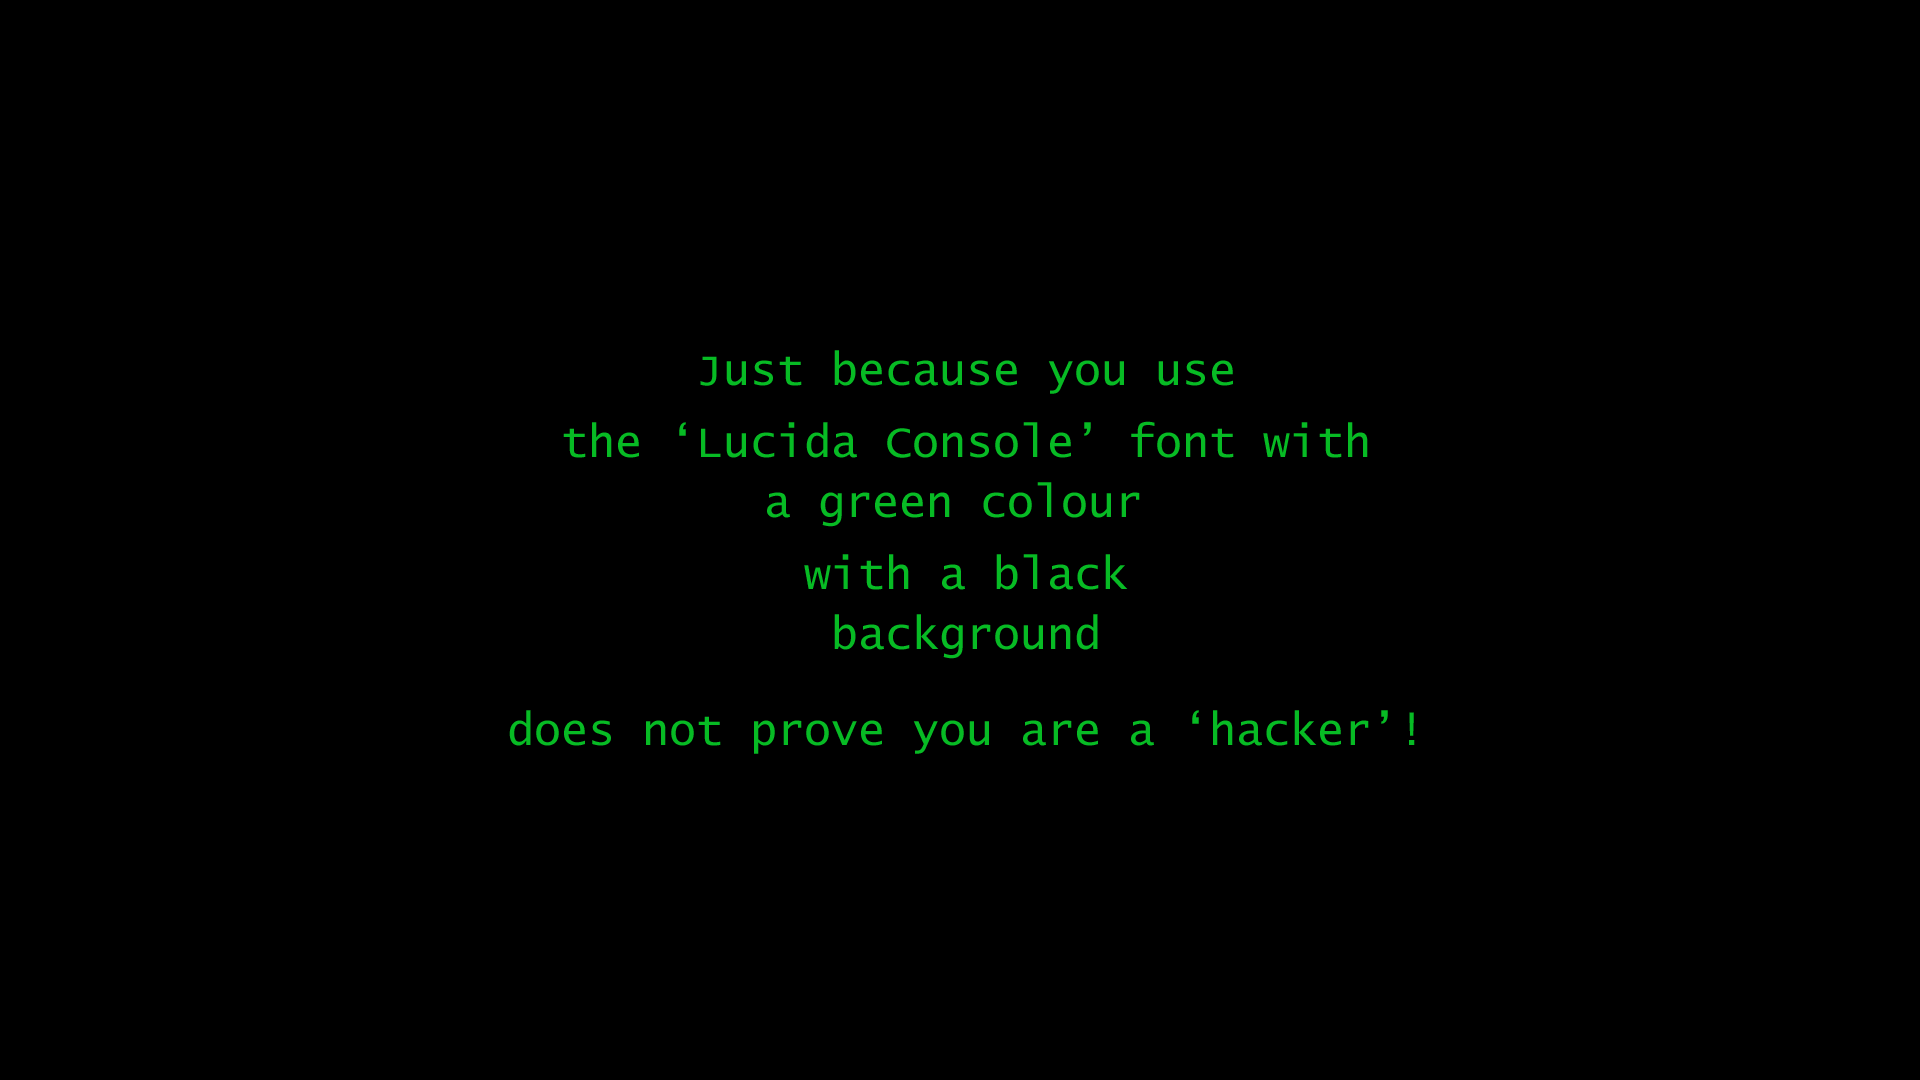 hacker wallpaper 1920x1080 - photo #3